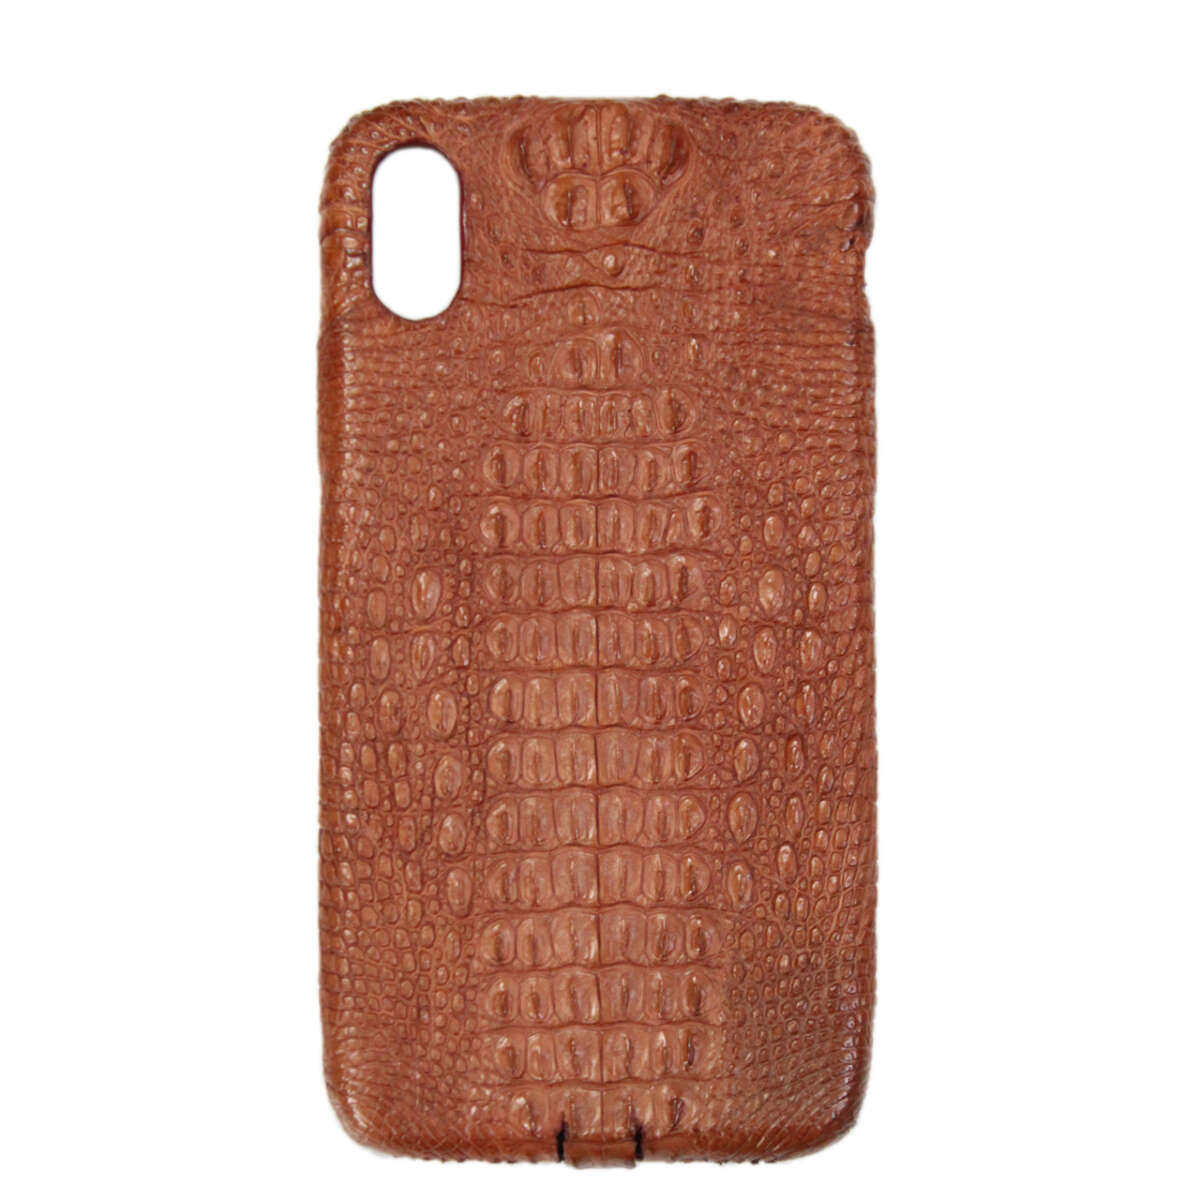 Ốp lưng iPhone X/Xs da cá sấu S1061a